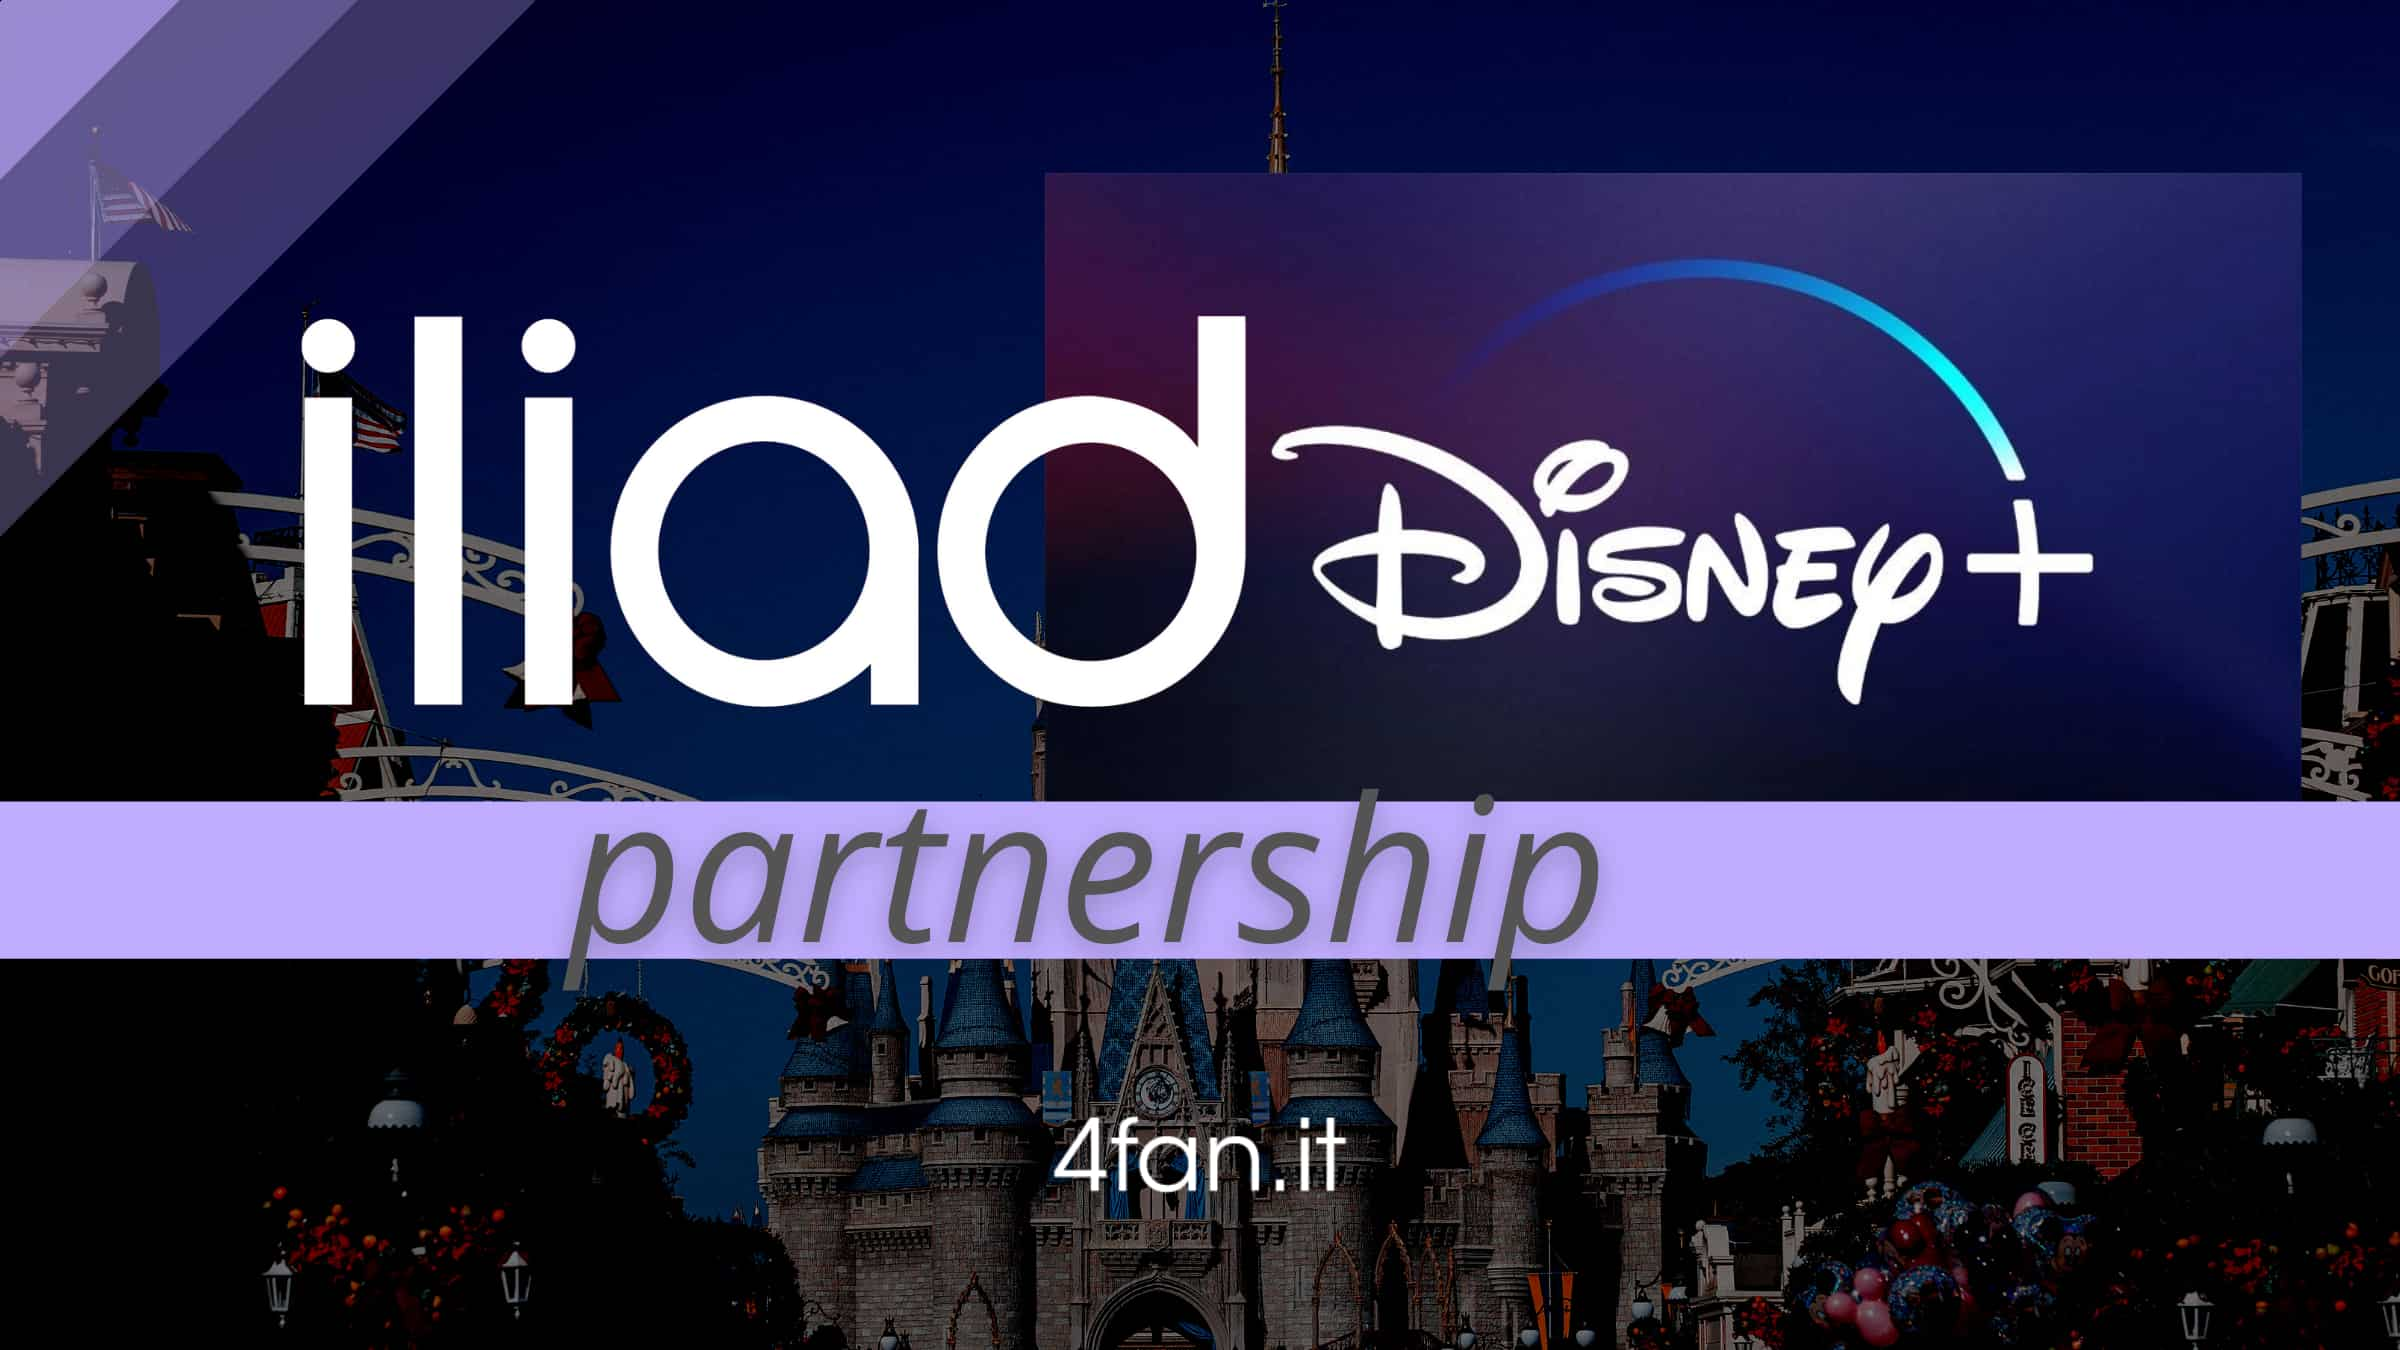 Iliad Disney Plus partnership